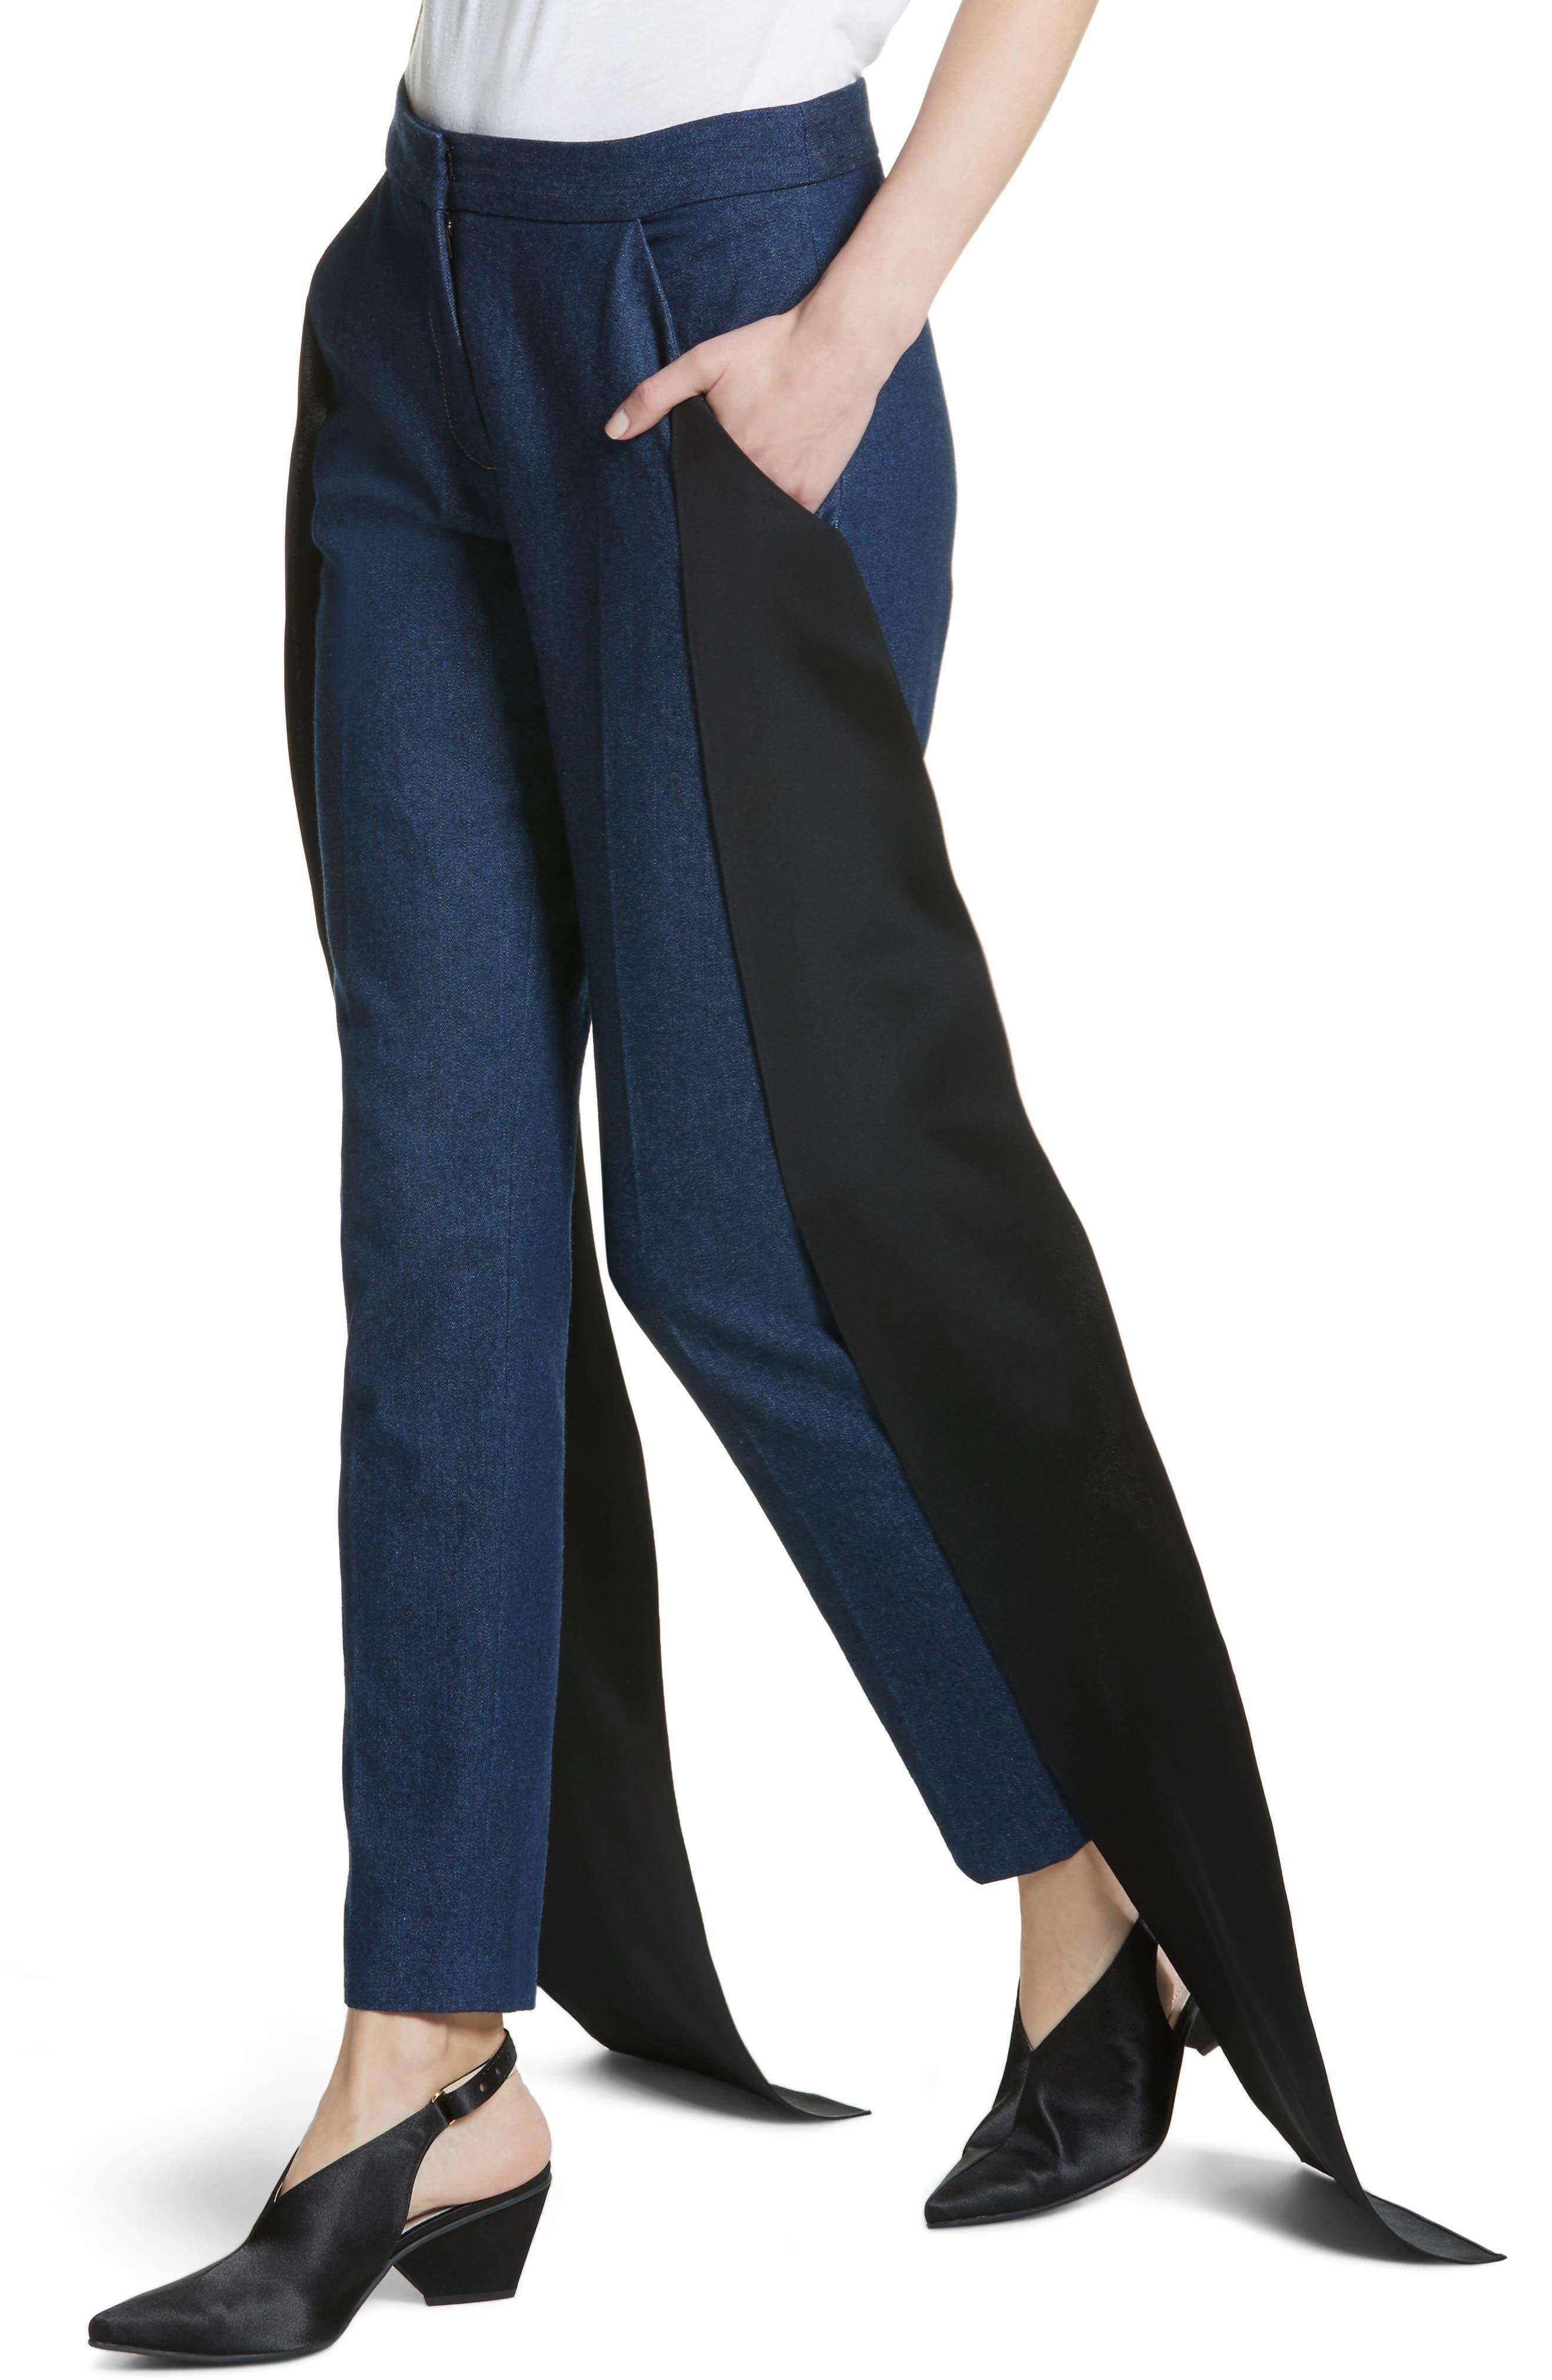 Mojave Side Panel Skinny Jeans,                             Alternate thumbnail 6, color,                             Dark Wash Denim